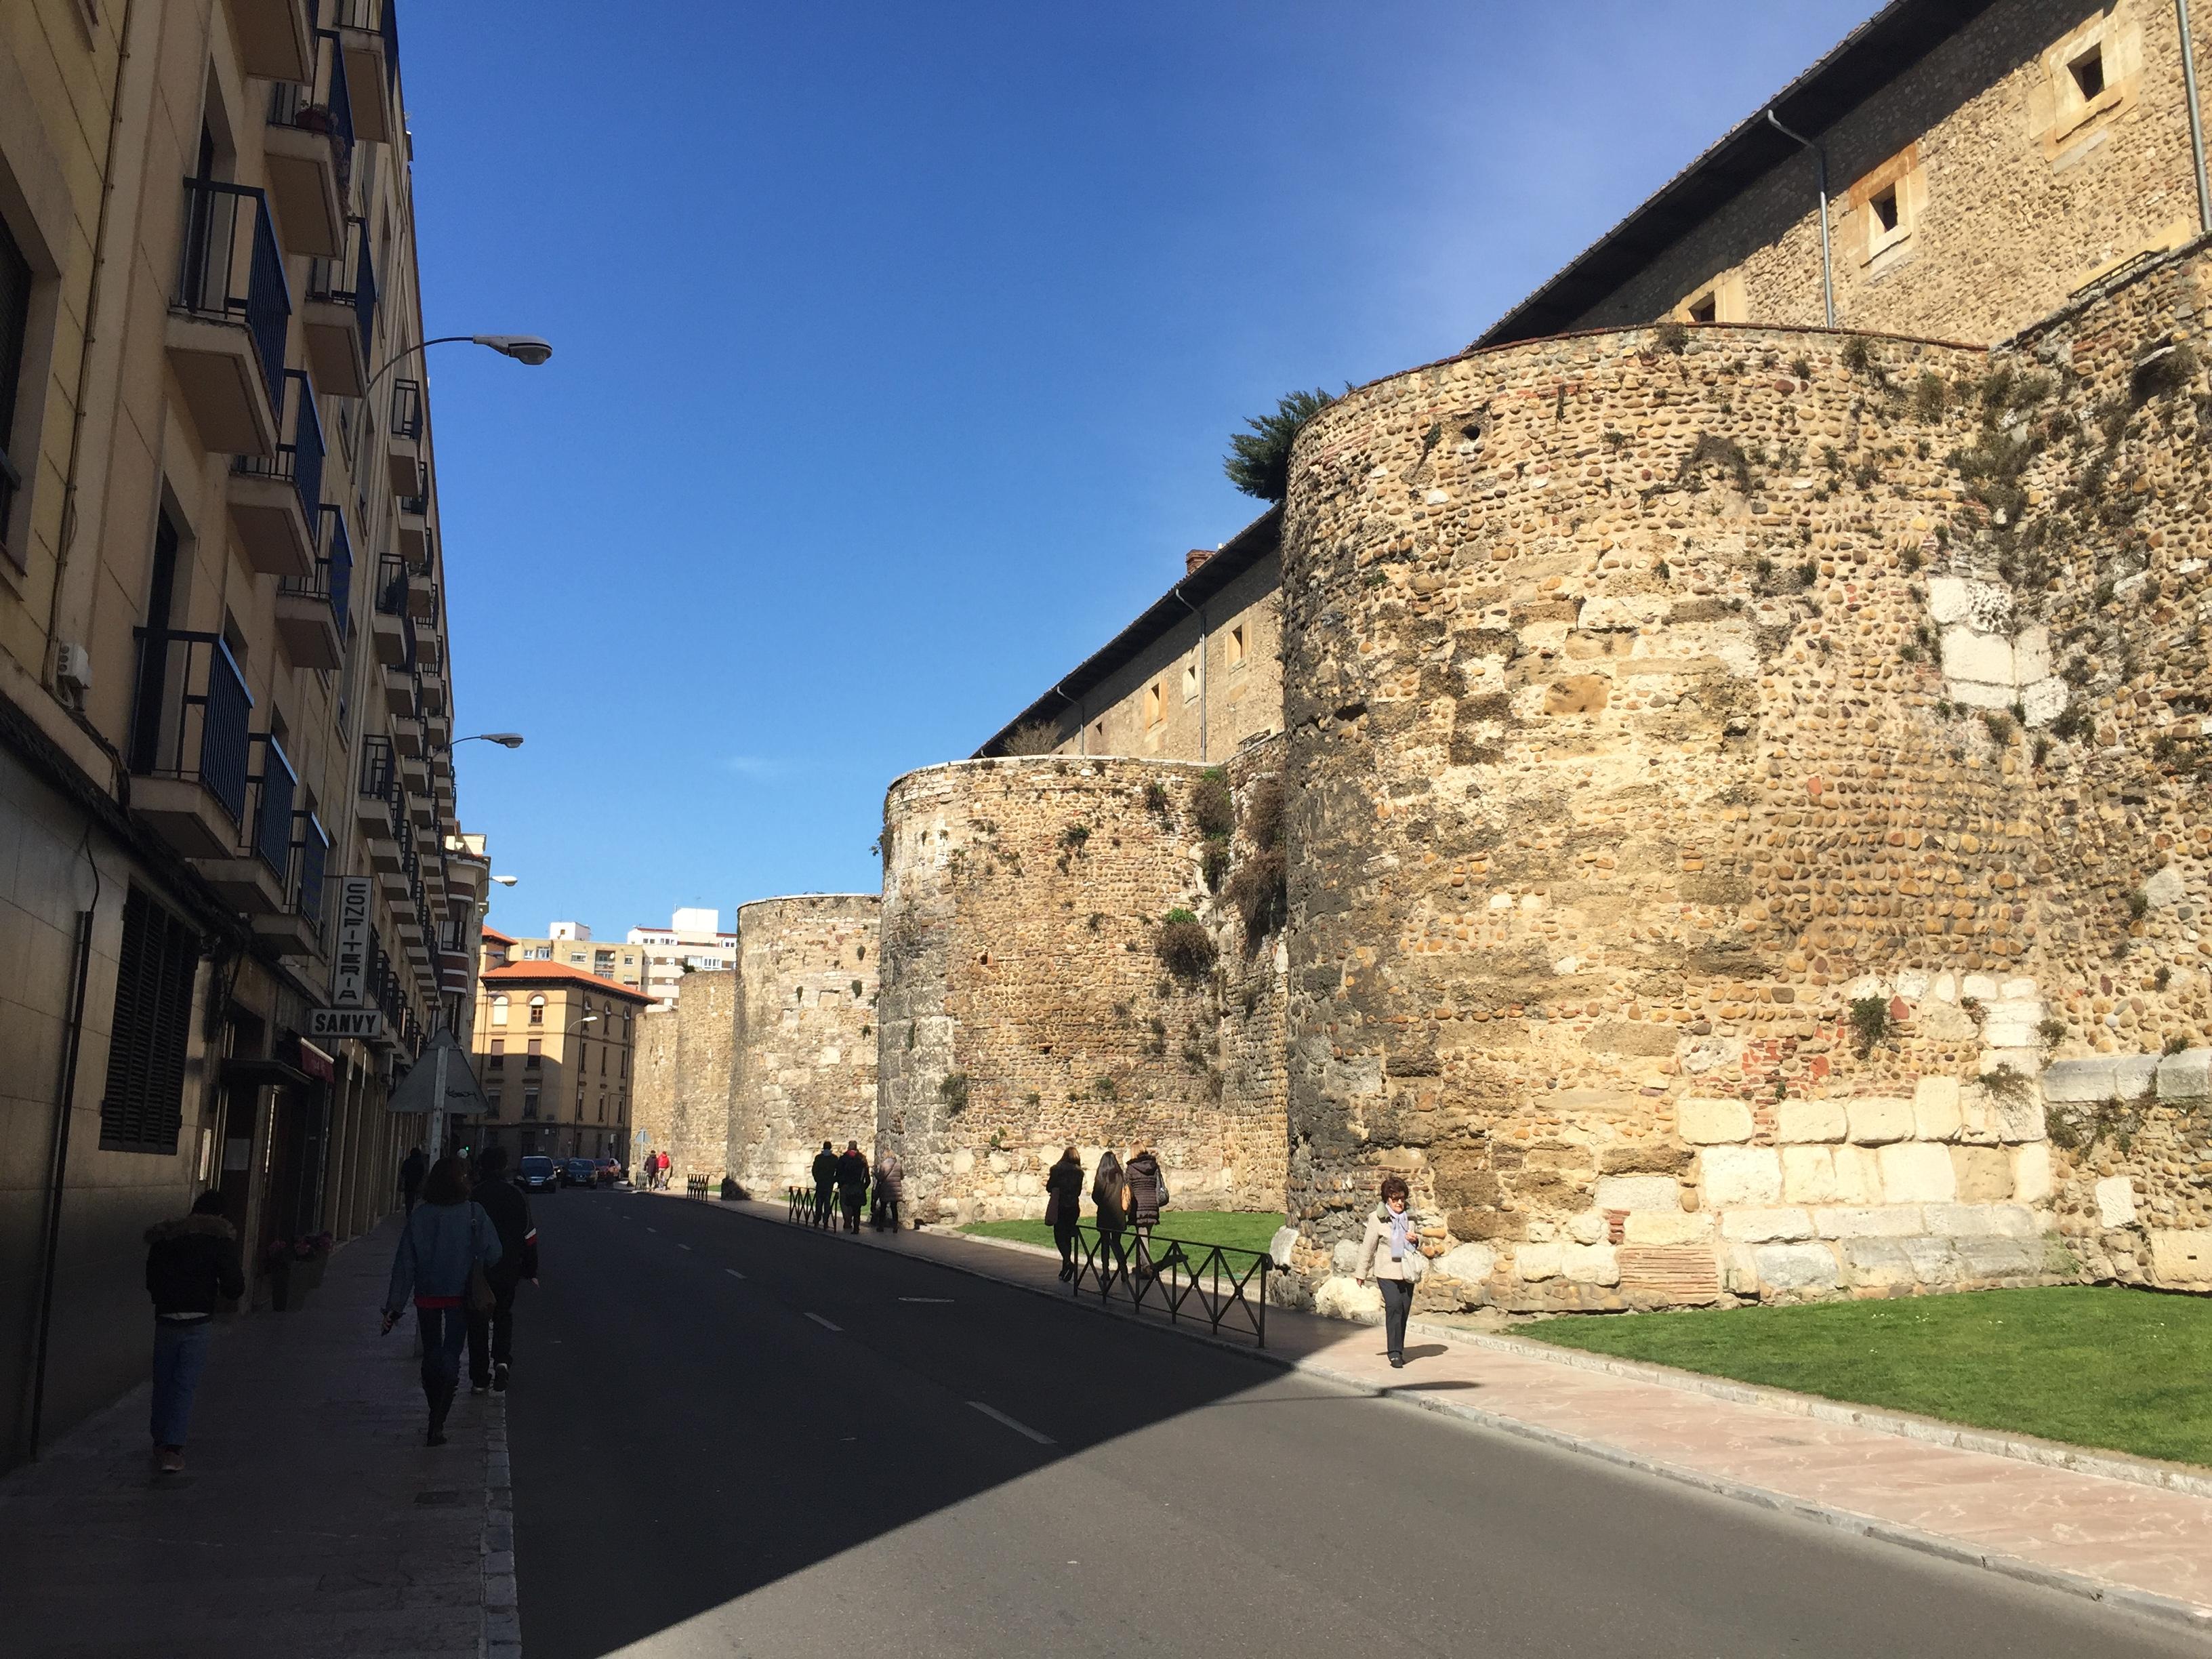 La muralla romana de León con Amigos & Arte